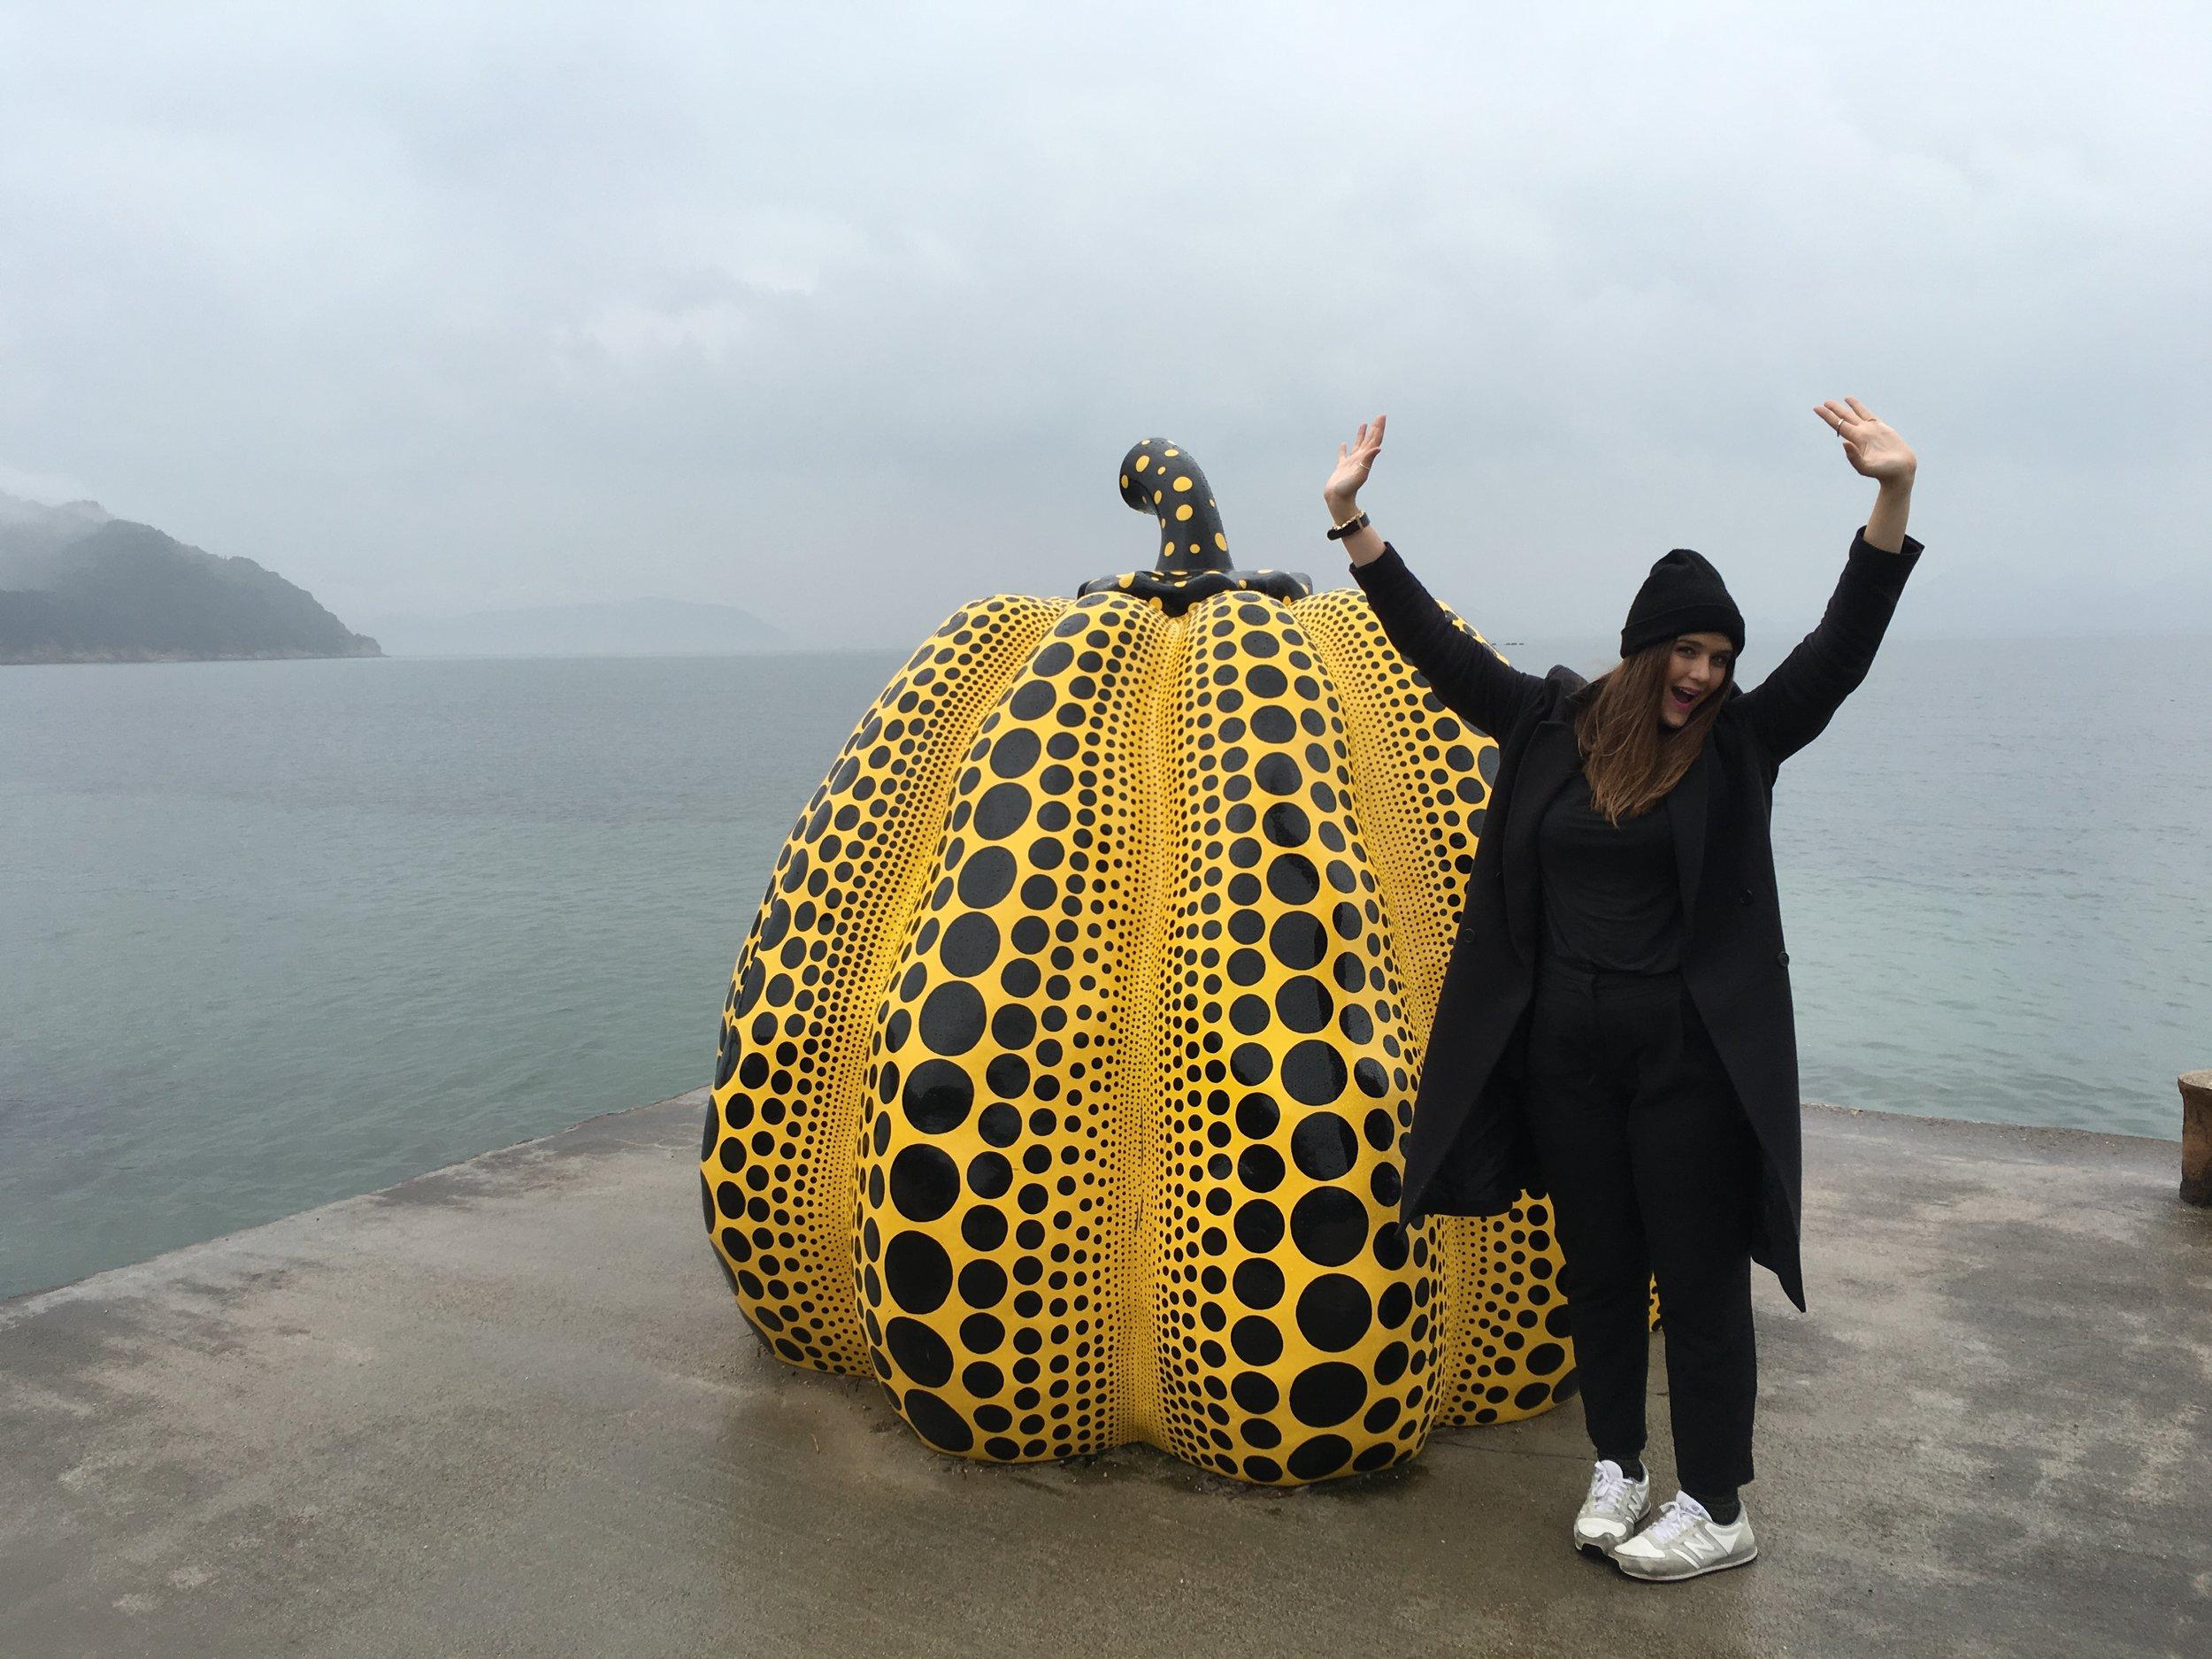 Me and an excellent pumpkin